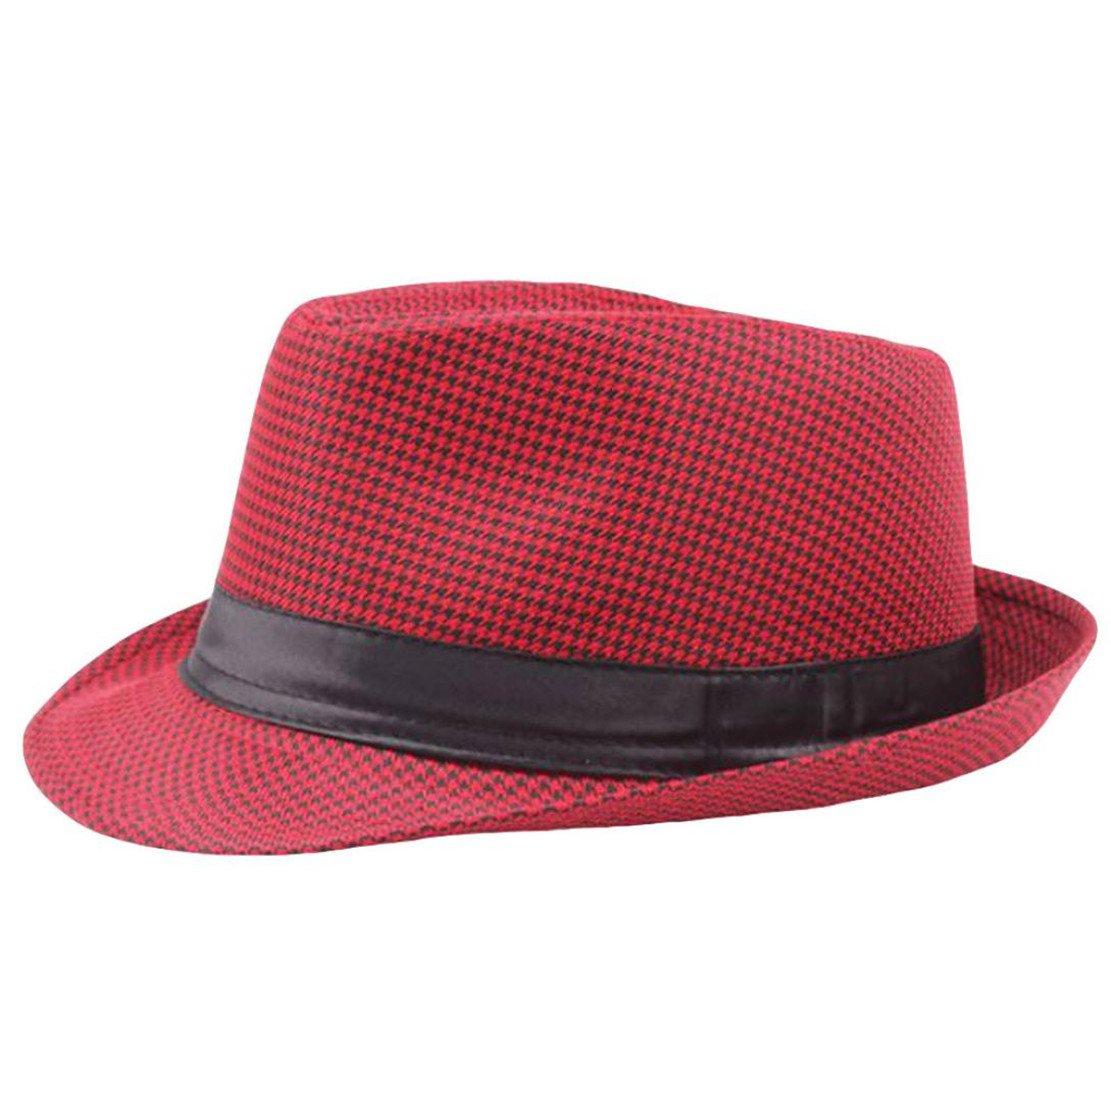 Bringbring Unisex Trilby Gangster Cap Beach Sun Hat